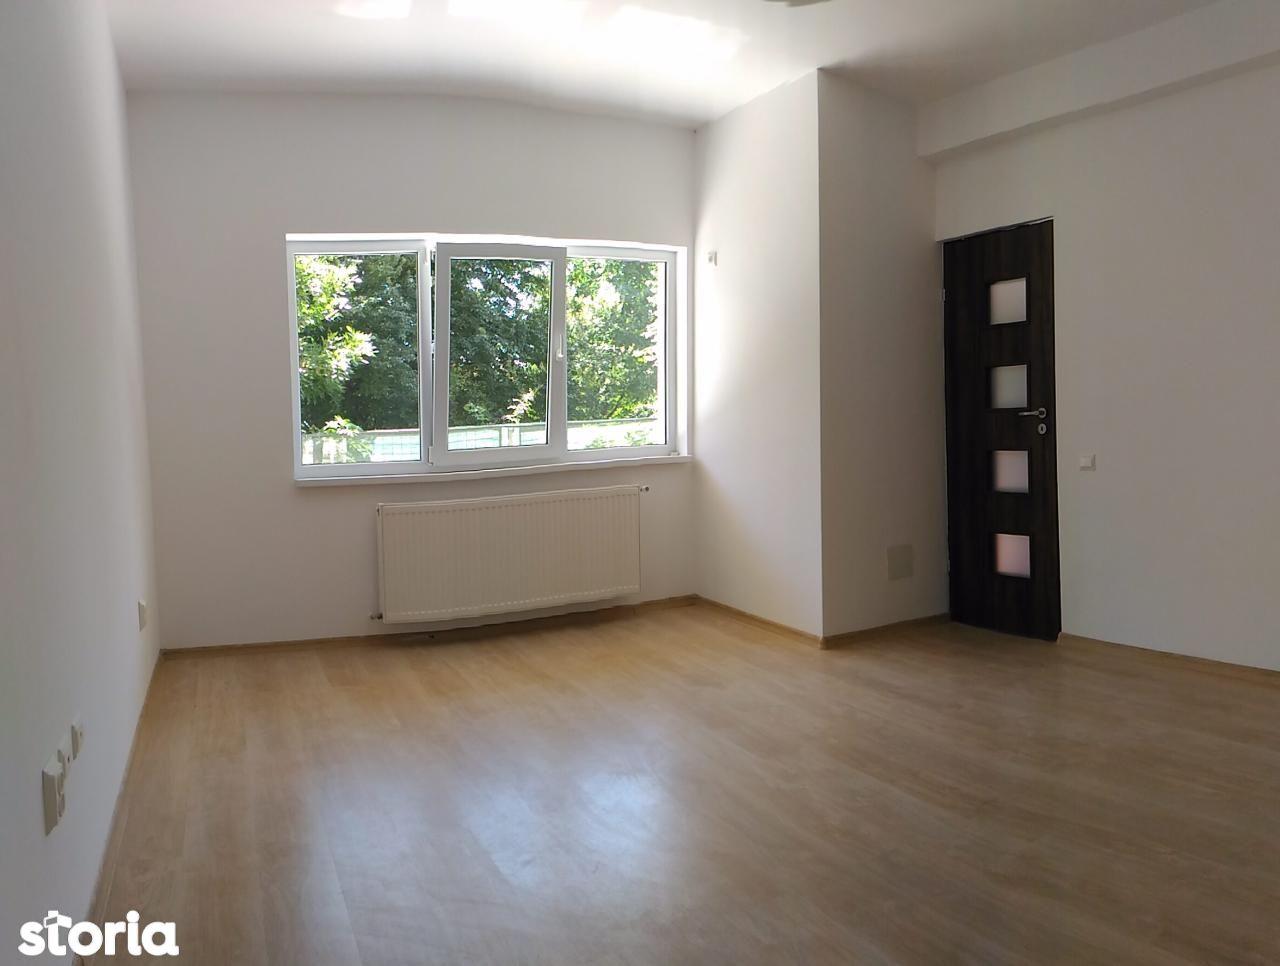 Apartament de vanzare, Ilfov (judet), Popeşti-Leordeni - Foto 9